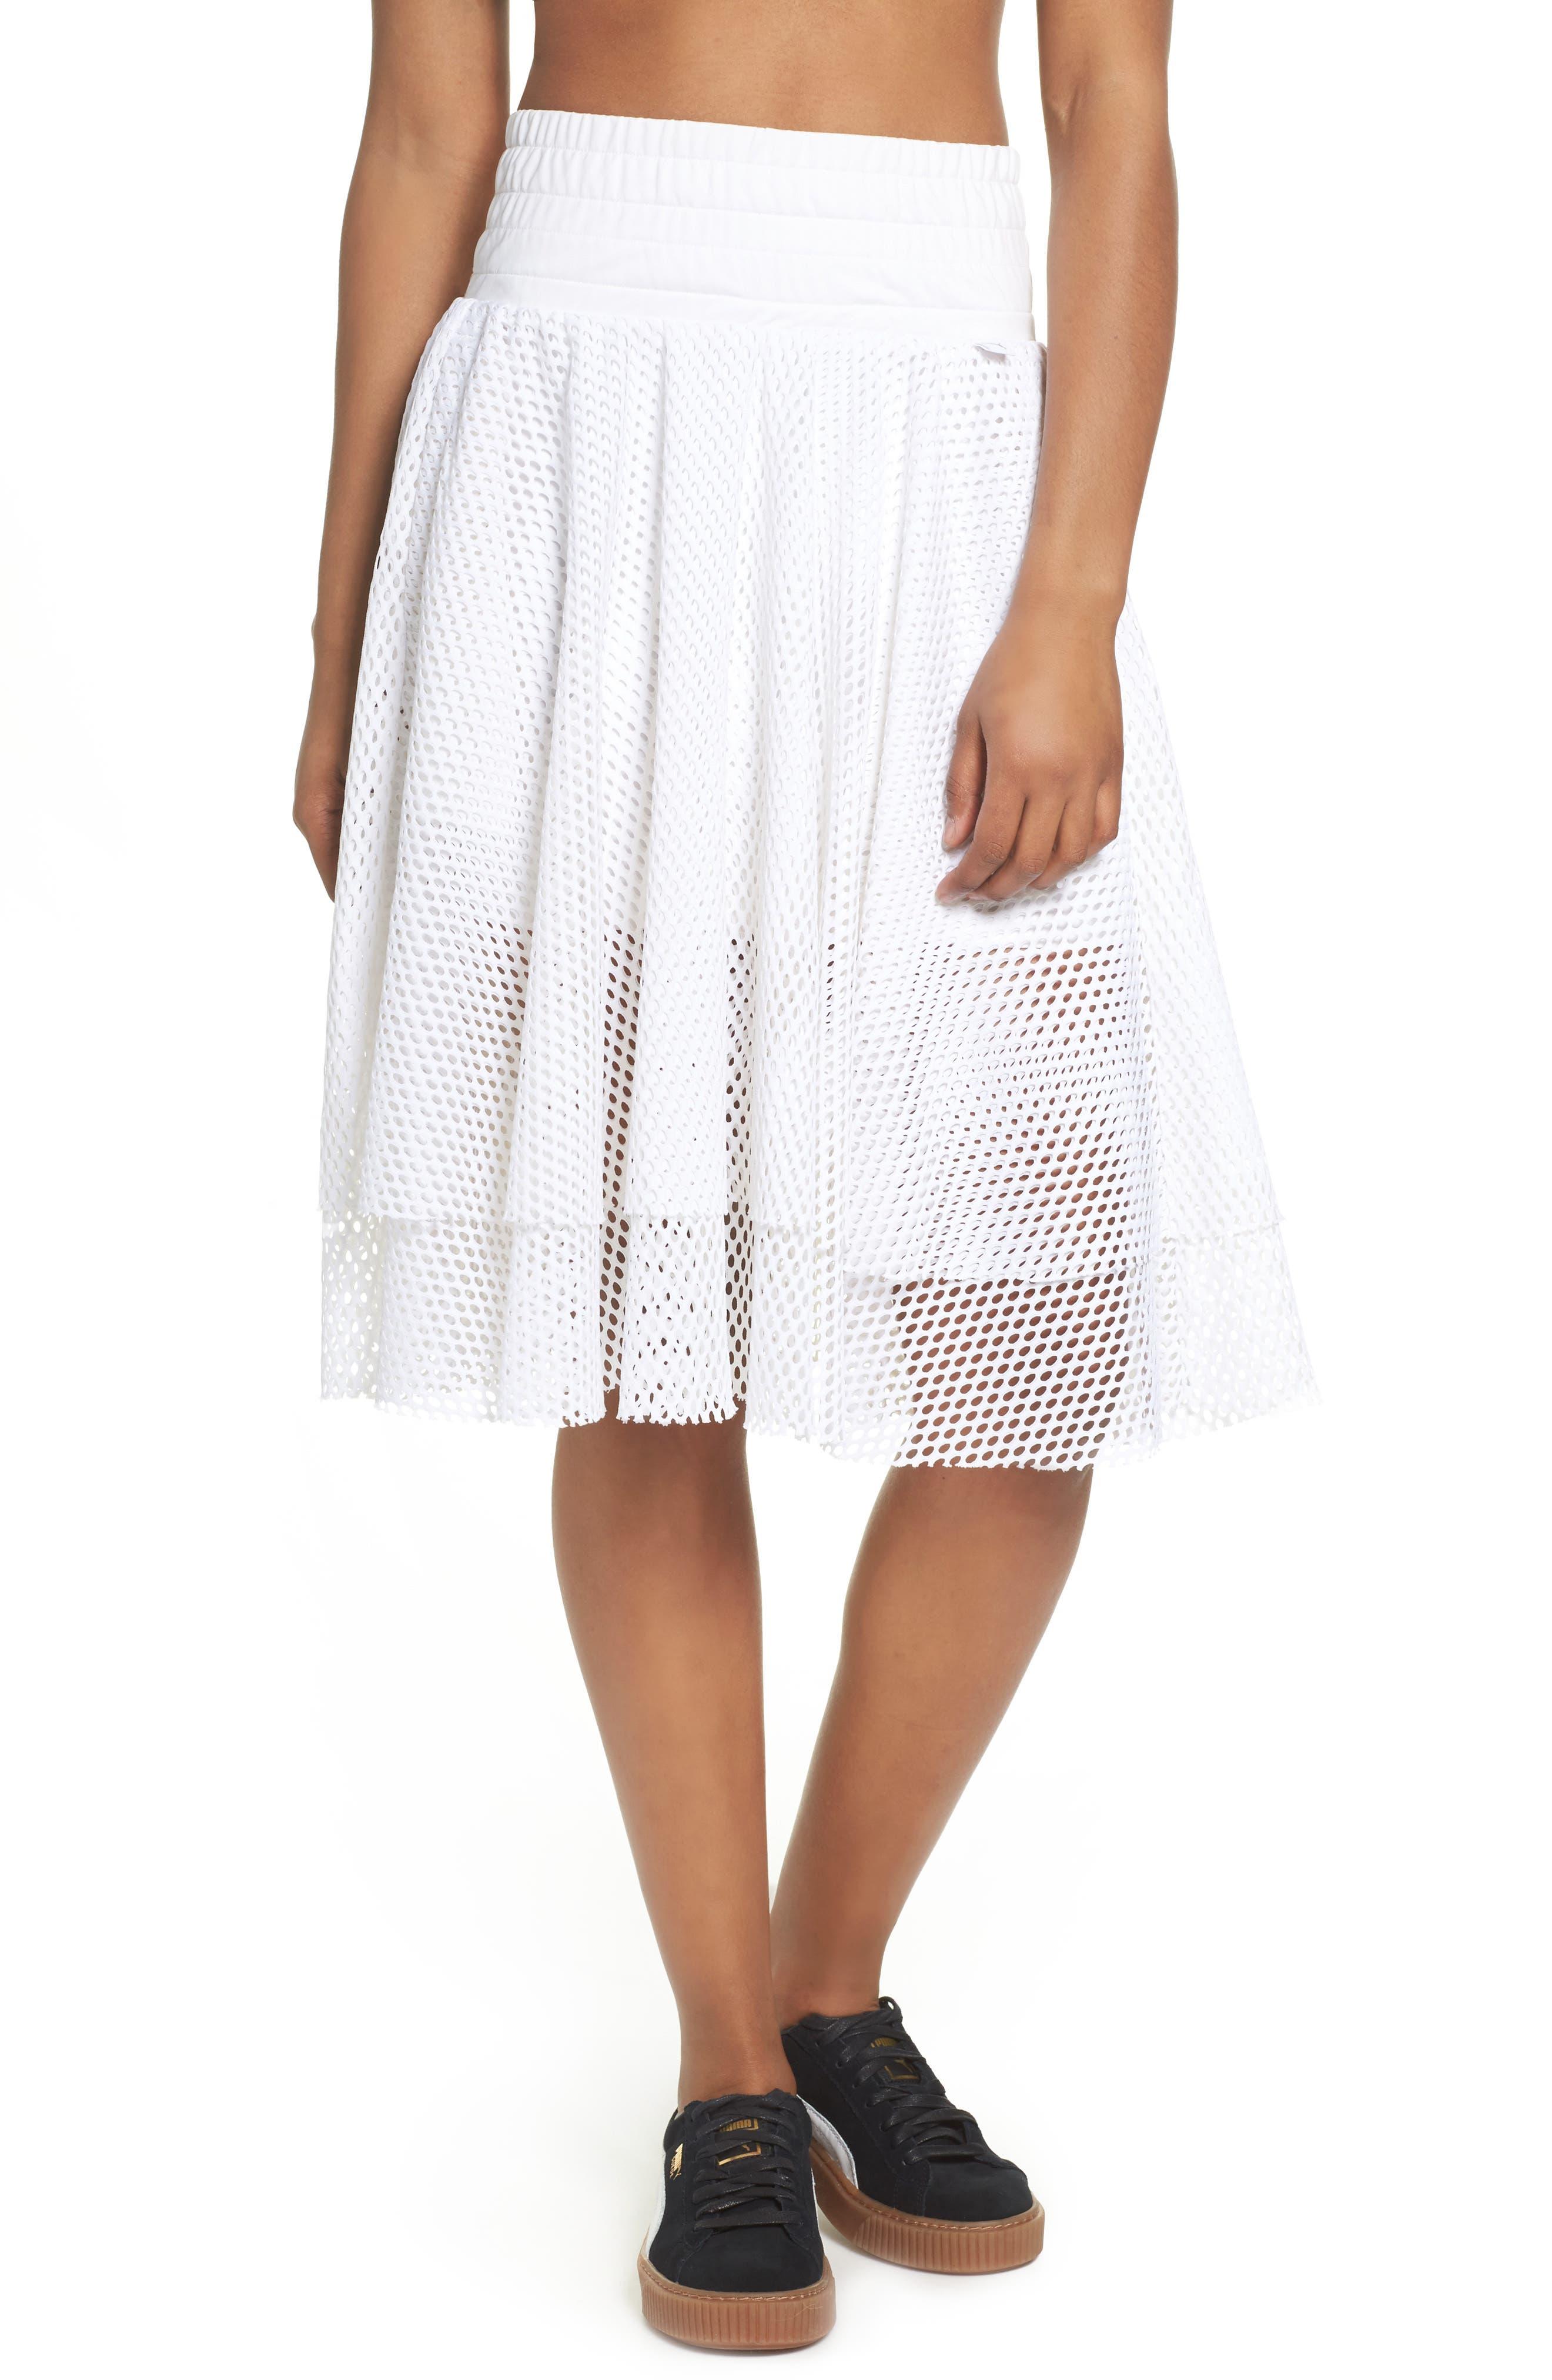 PUMA En Pointe Mesh Skirt